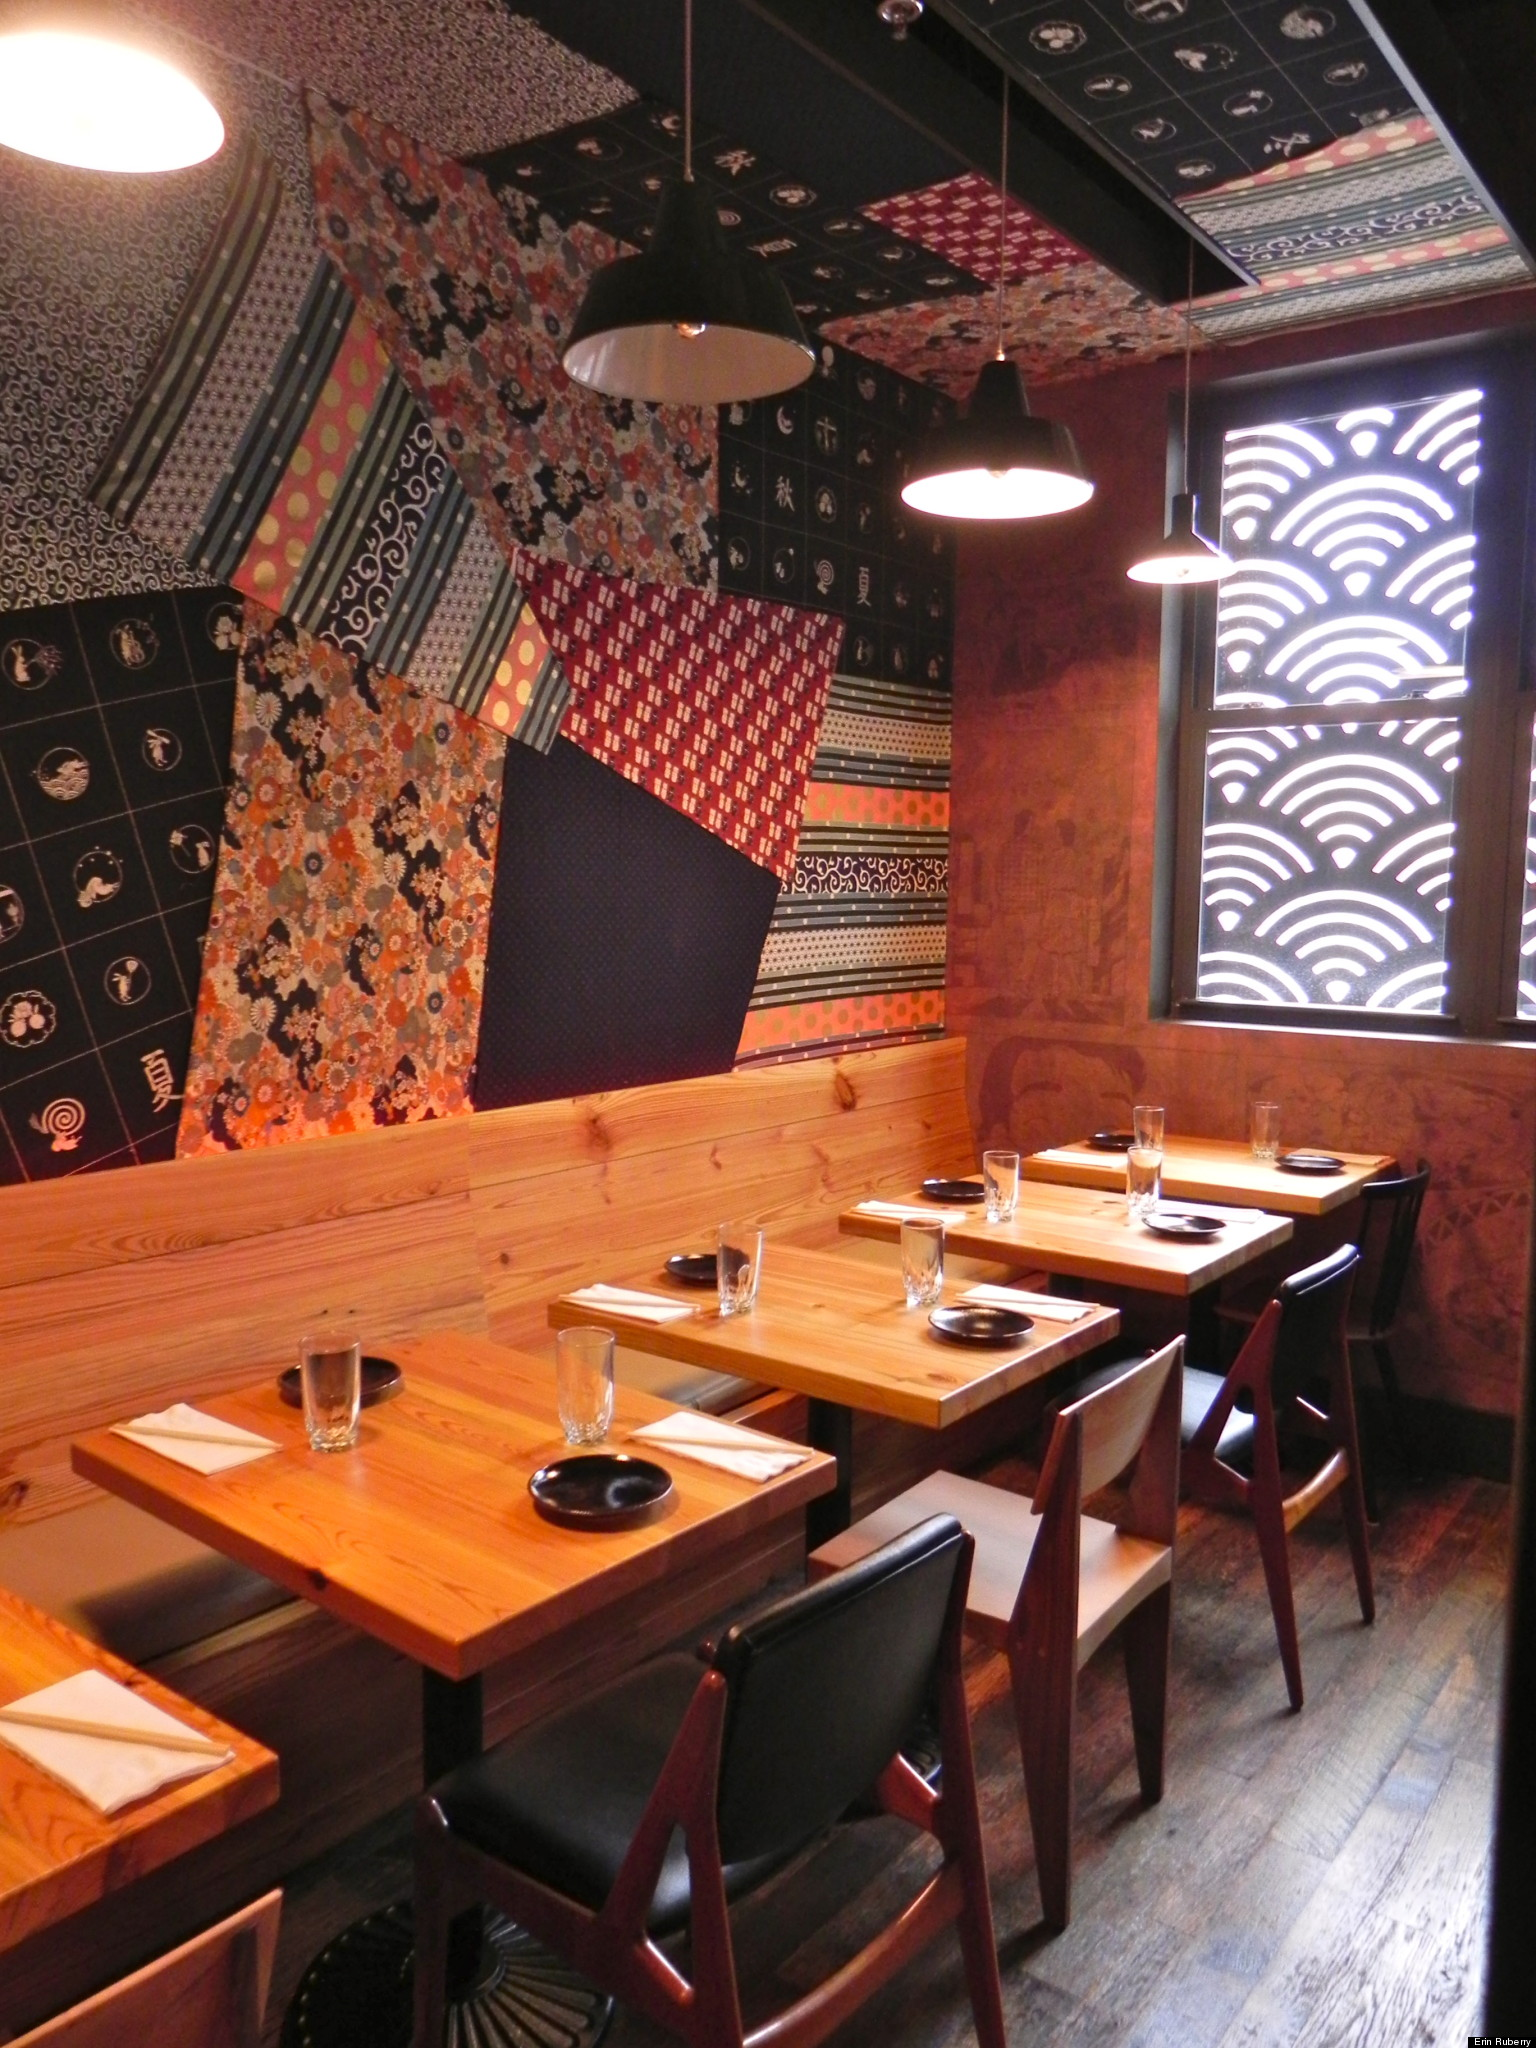 Izakaya daikaya upstairs bar now open in penn quarter for Interior design and decoration 6th edition